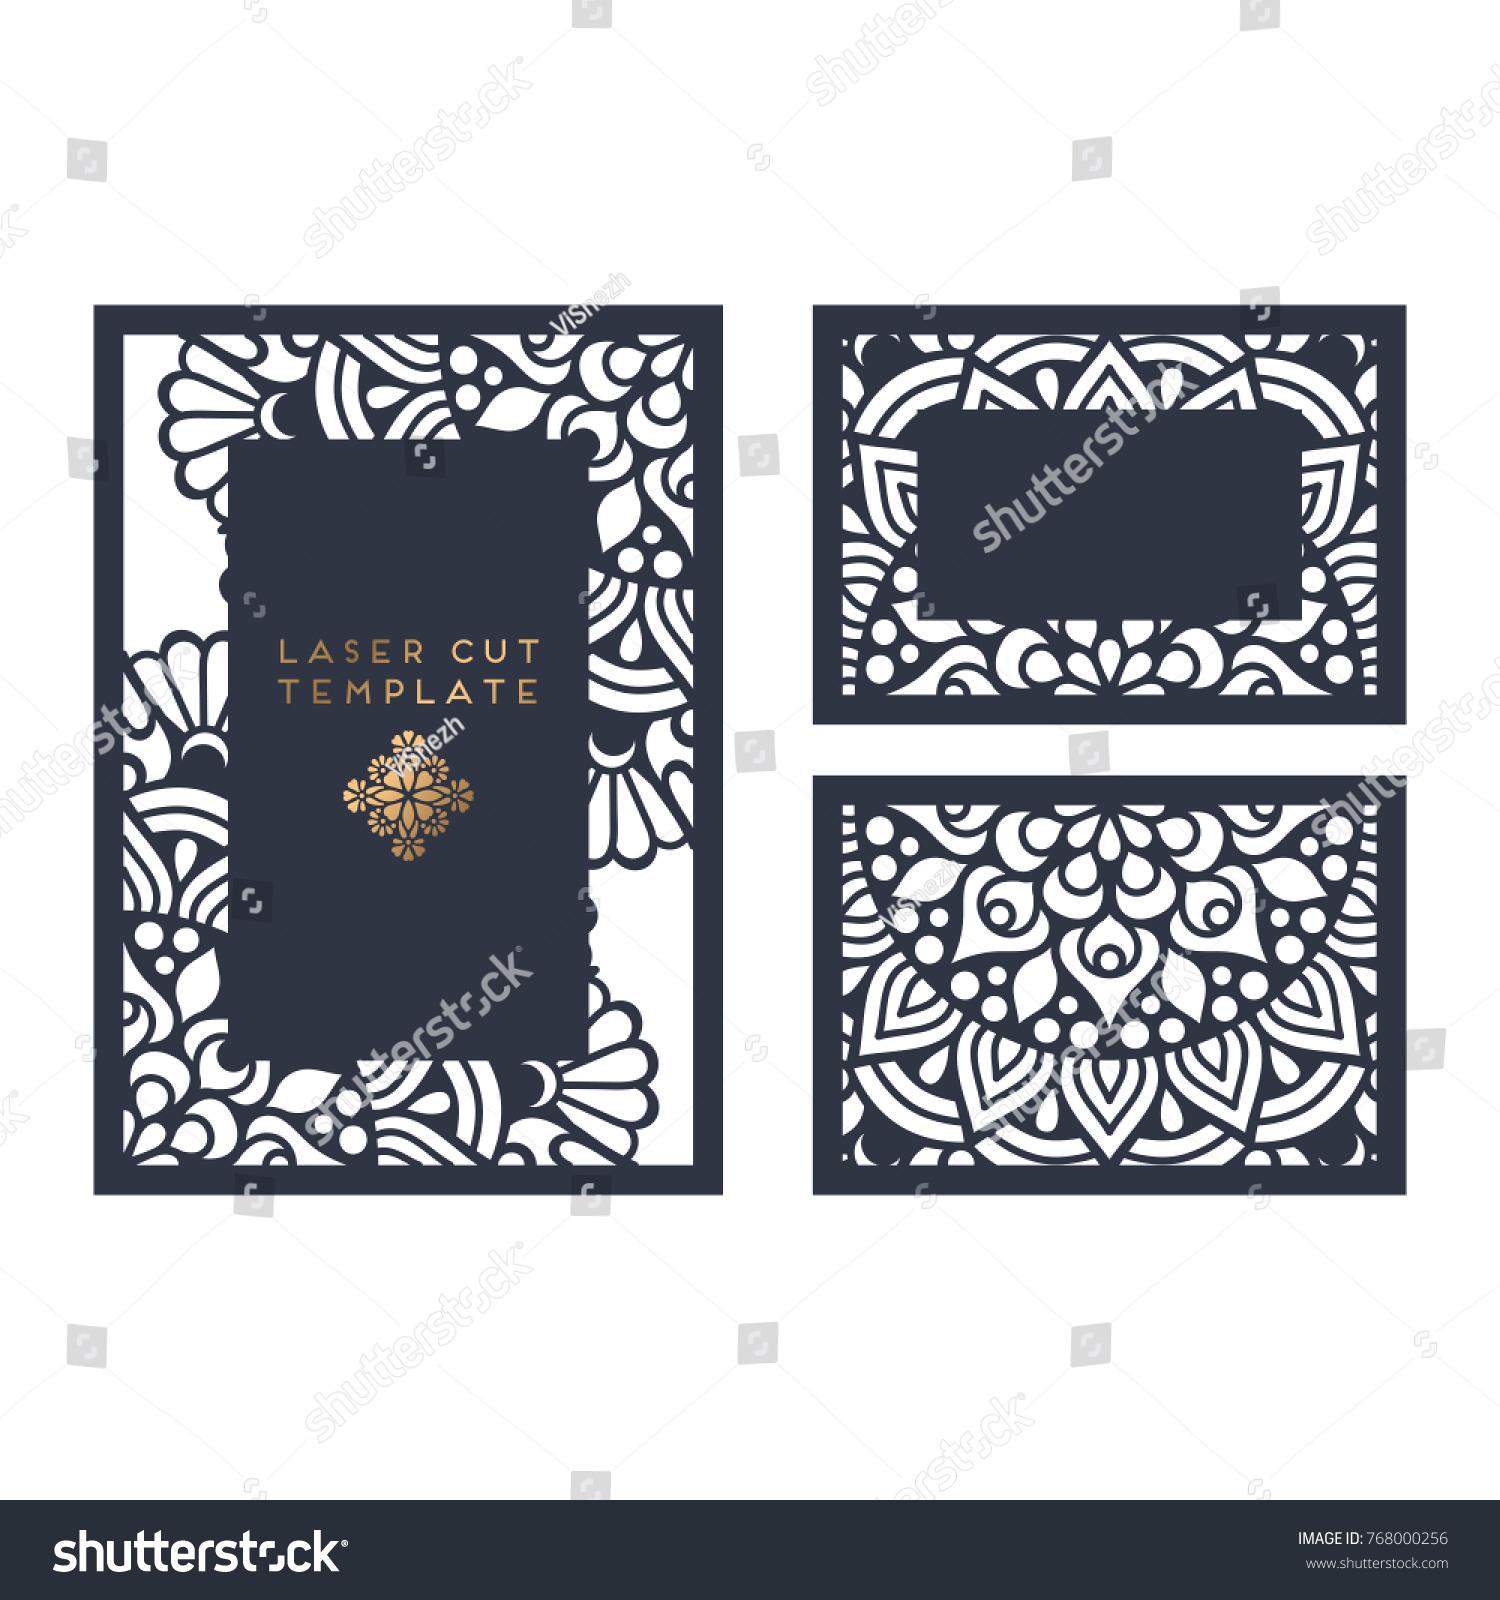 Vector wedding card laser cut template | EZ Canvas